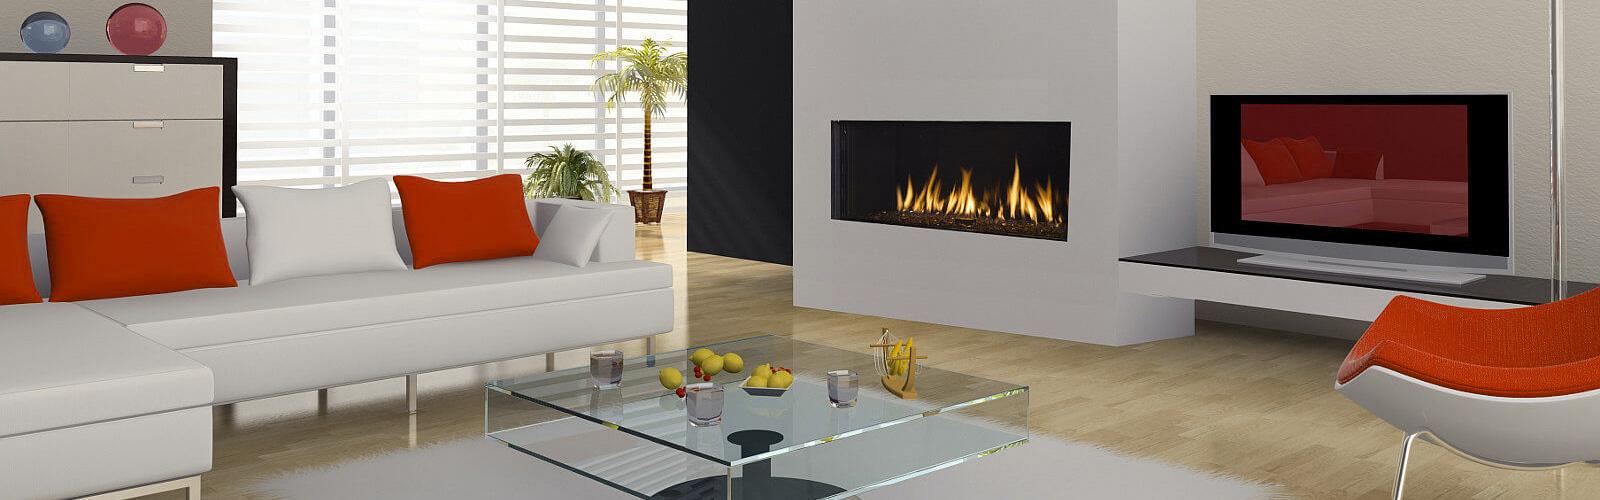 coast interior calgary u2013 flooring plumbing lighting fireplace